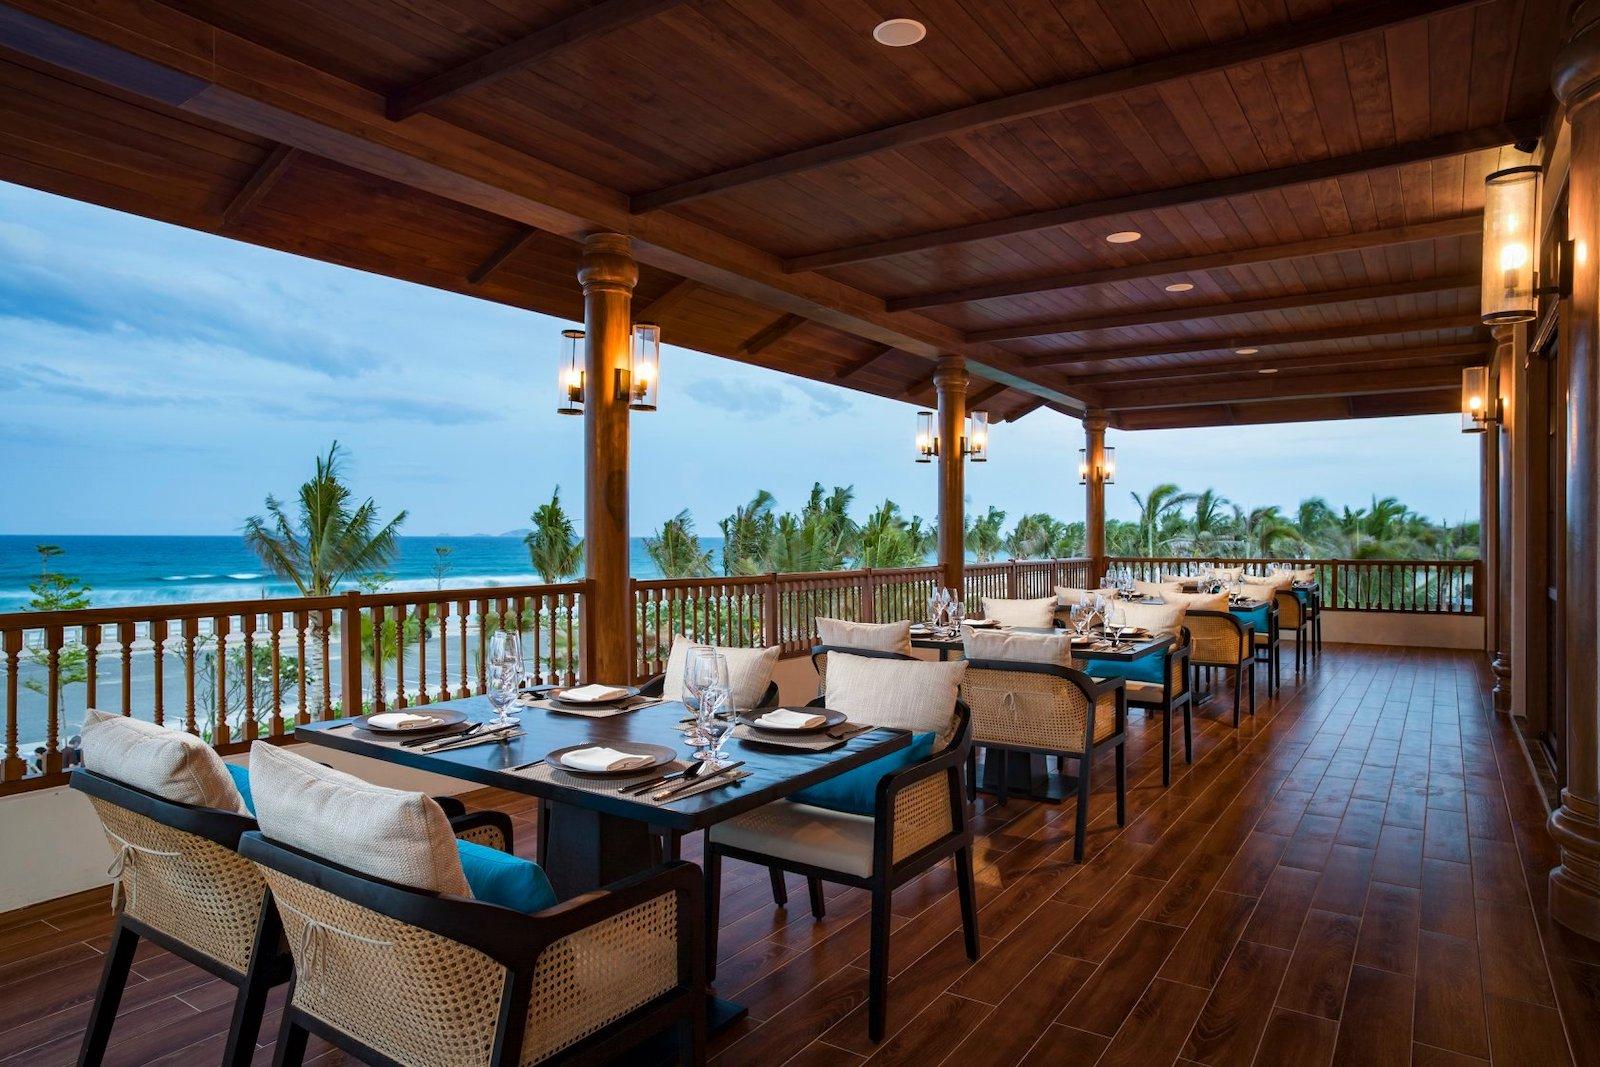 Image of the Blu Lobster Restaurant at the Raddison Blu Resort in Cam Ranh, Vietnam